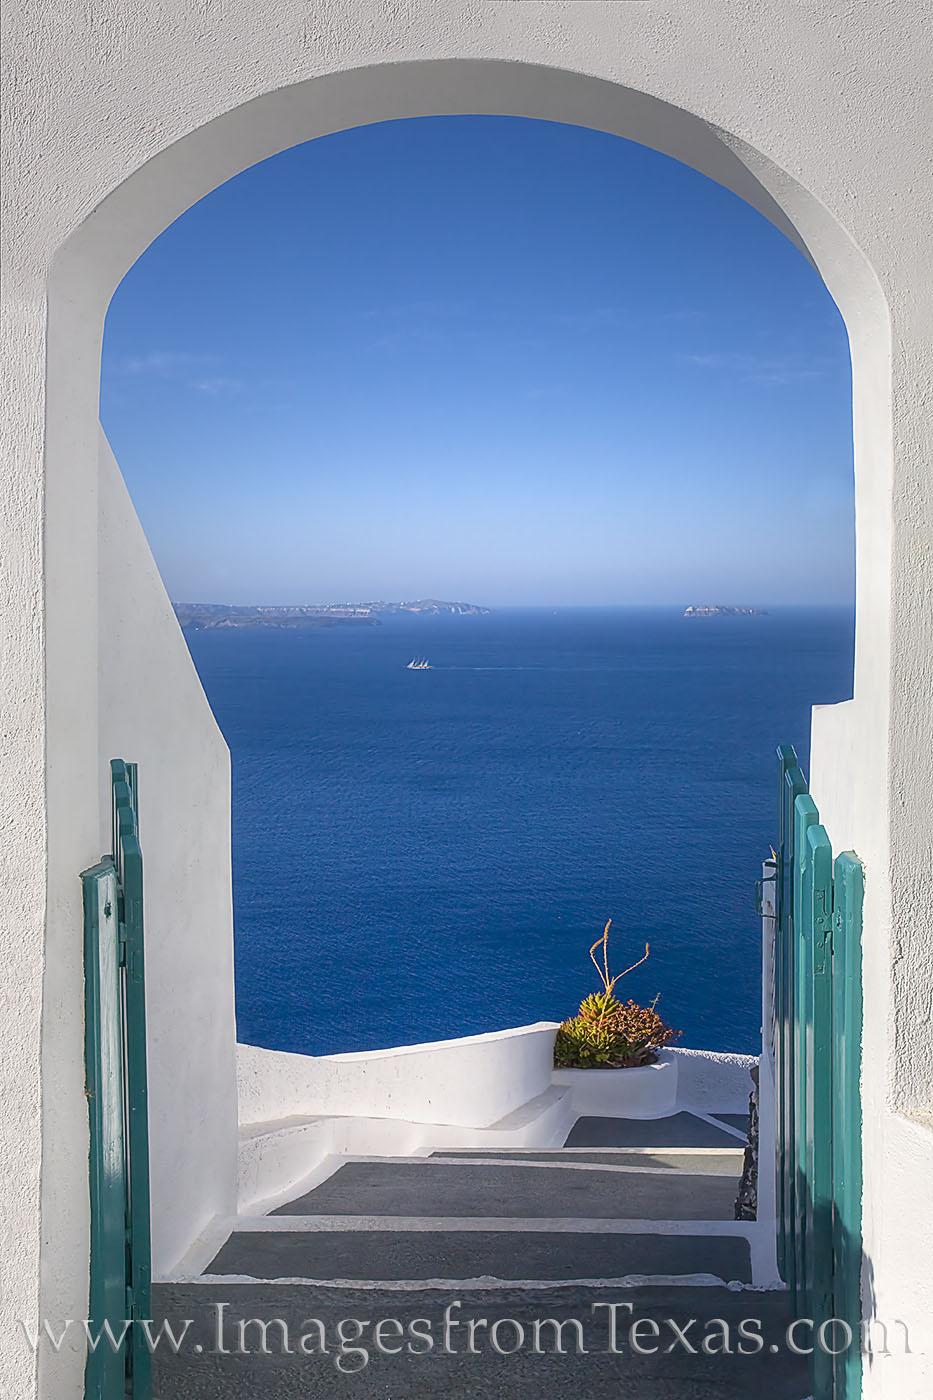 oia, santorini, greek islands, aegean, caldera, ocean, blue, doorway, escape, greece, holiday, photo